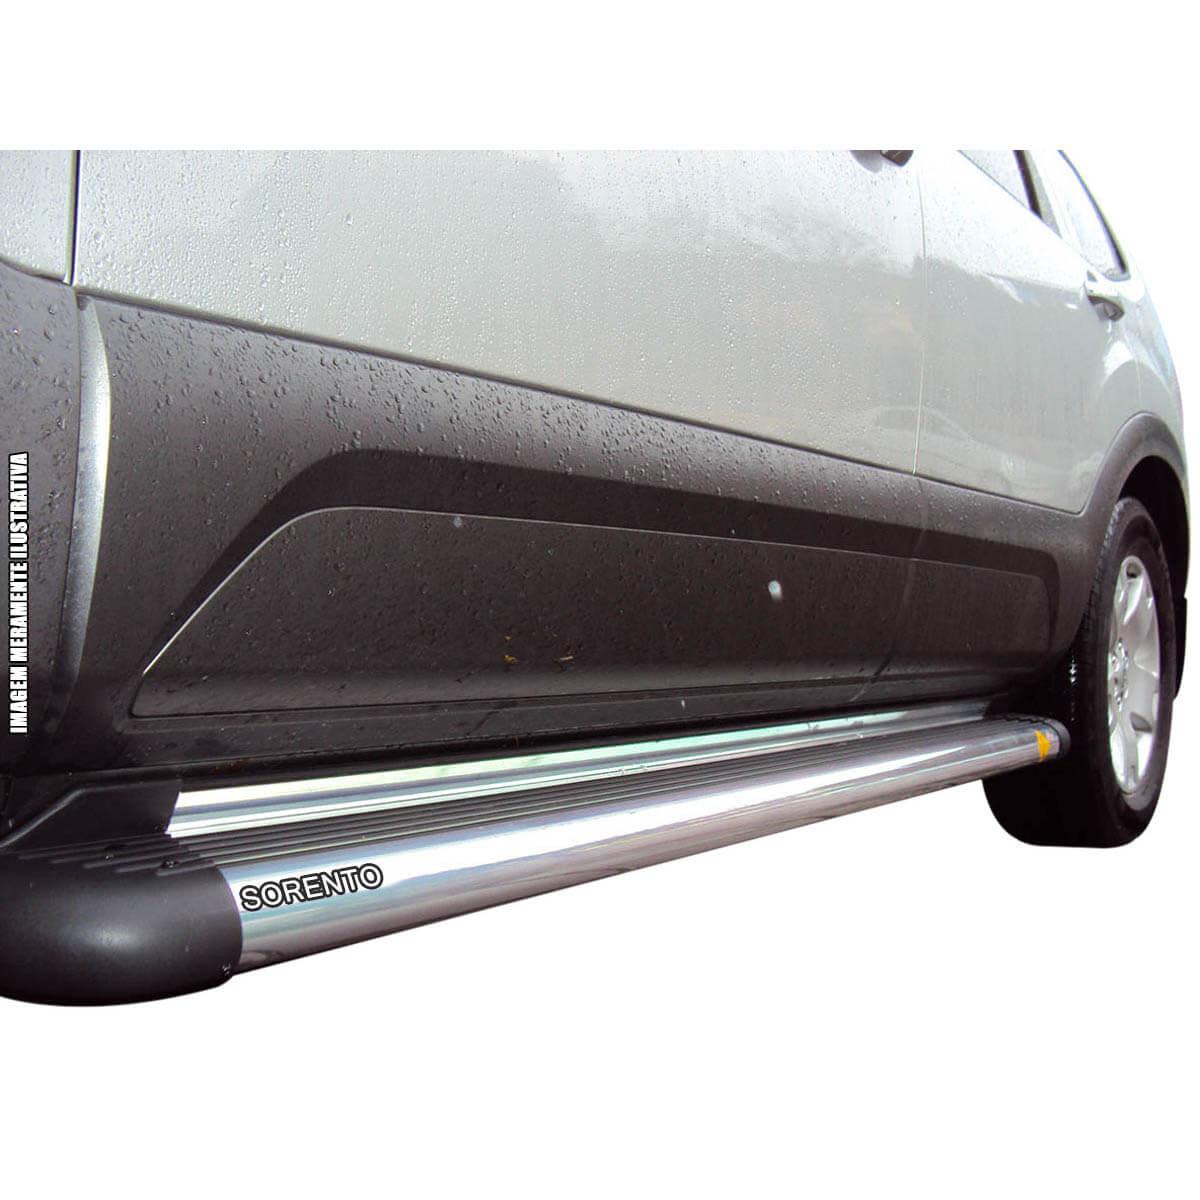 Estribo plataforma alumínio Sorento 2004 a 2009